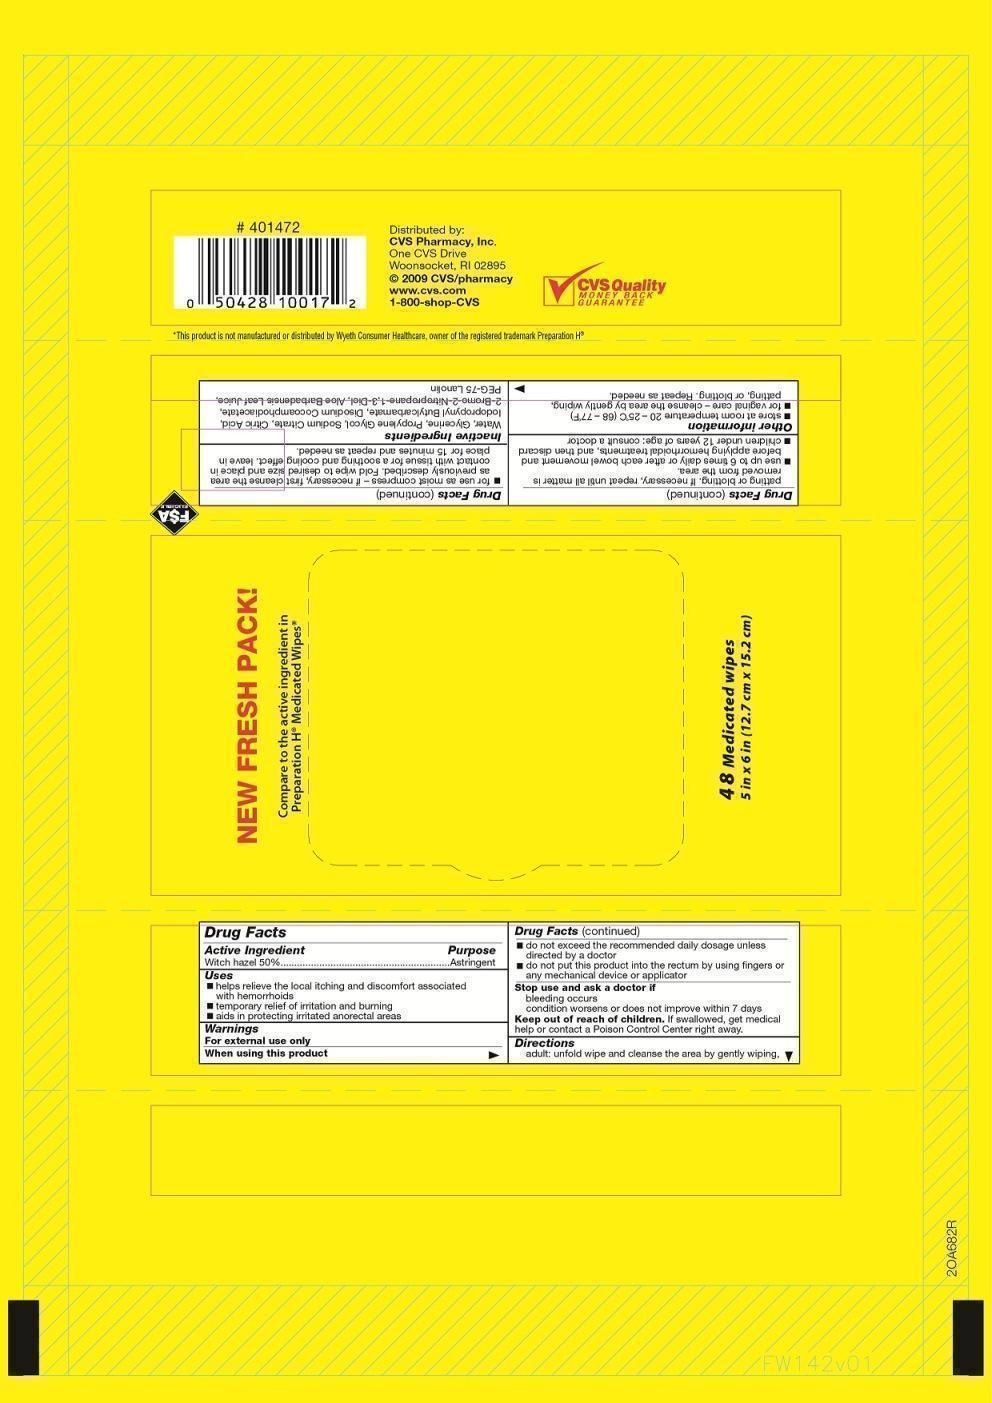 Image of Flowrap Label